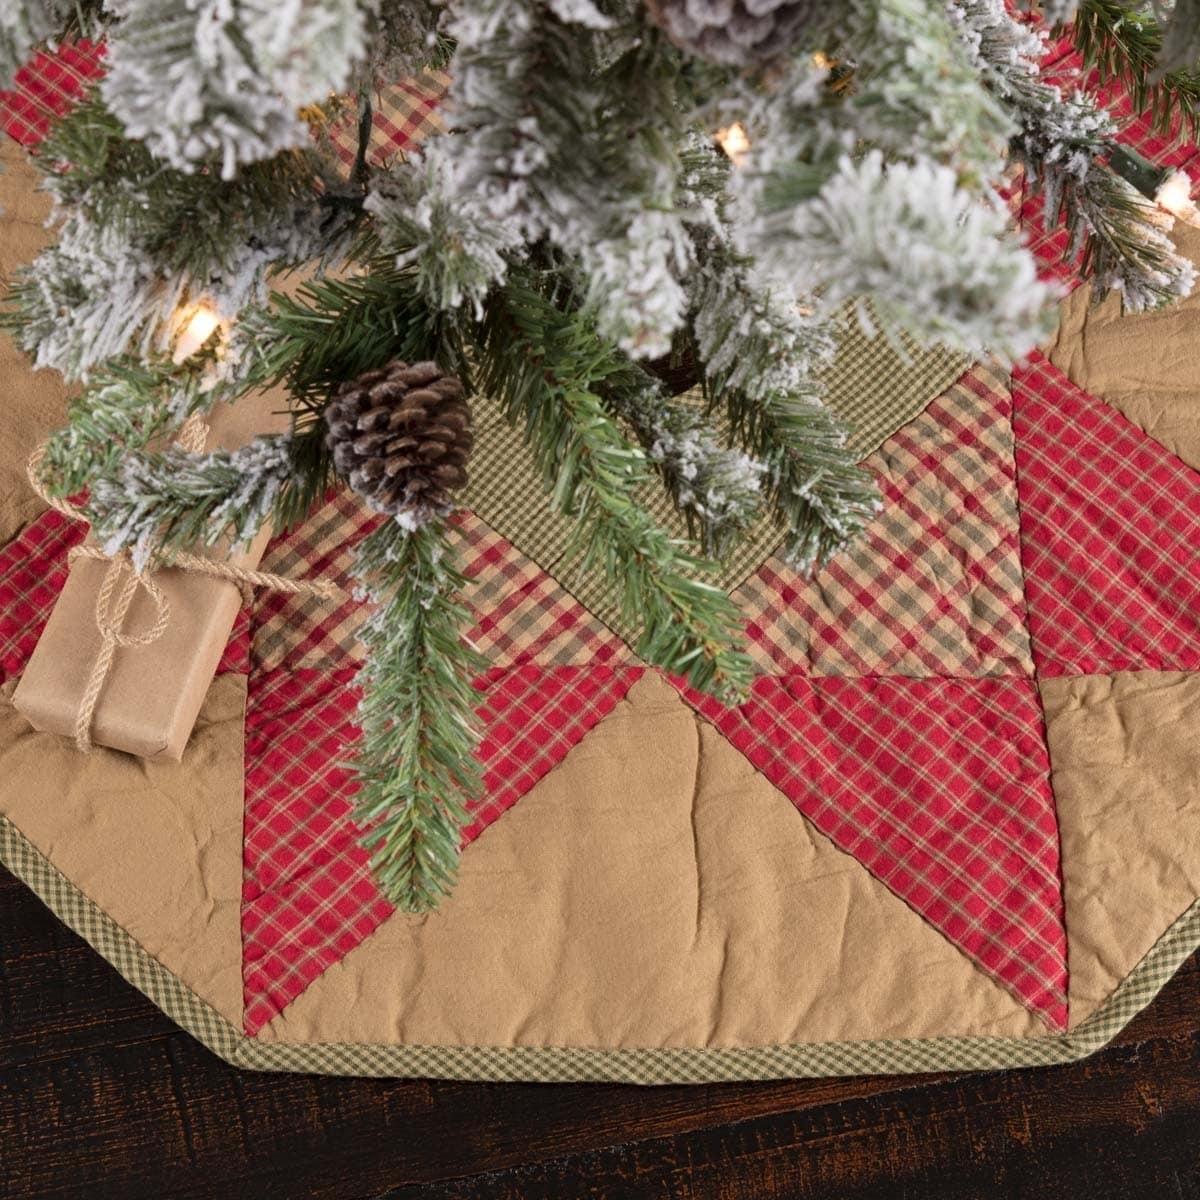 Tan Primitive Christmas Holiday Decor Vhc Dolly Star Tree Skirt Cotton Star Patchwork 21 Diameter